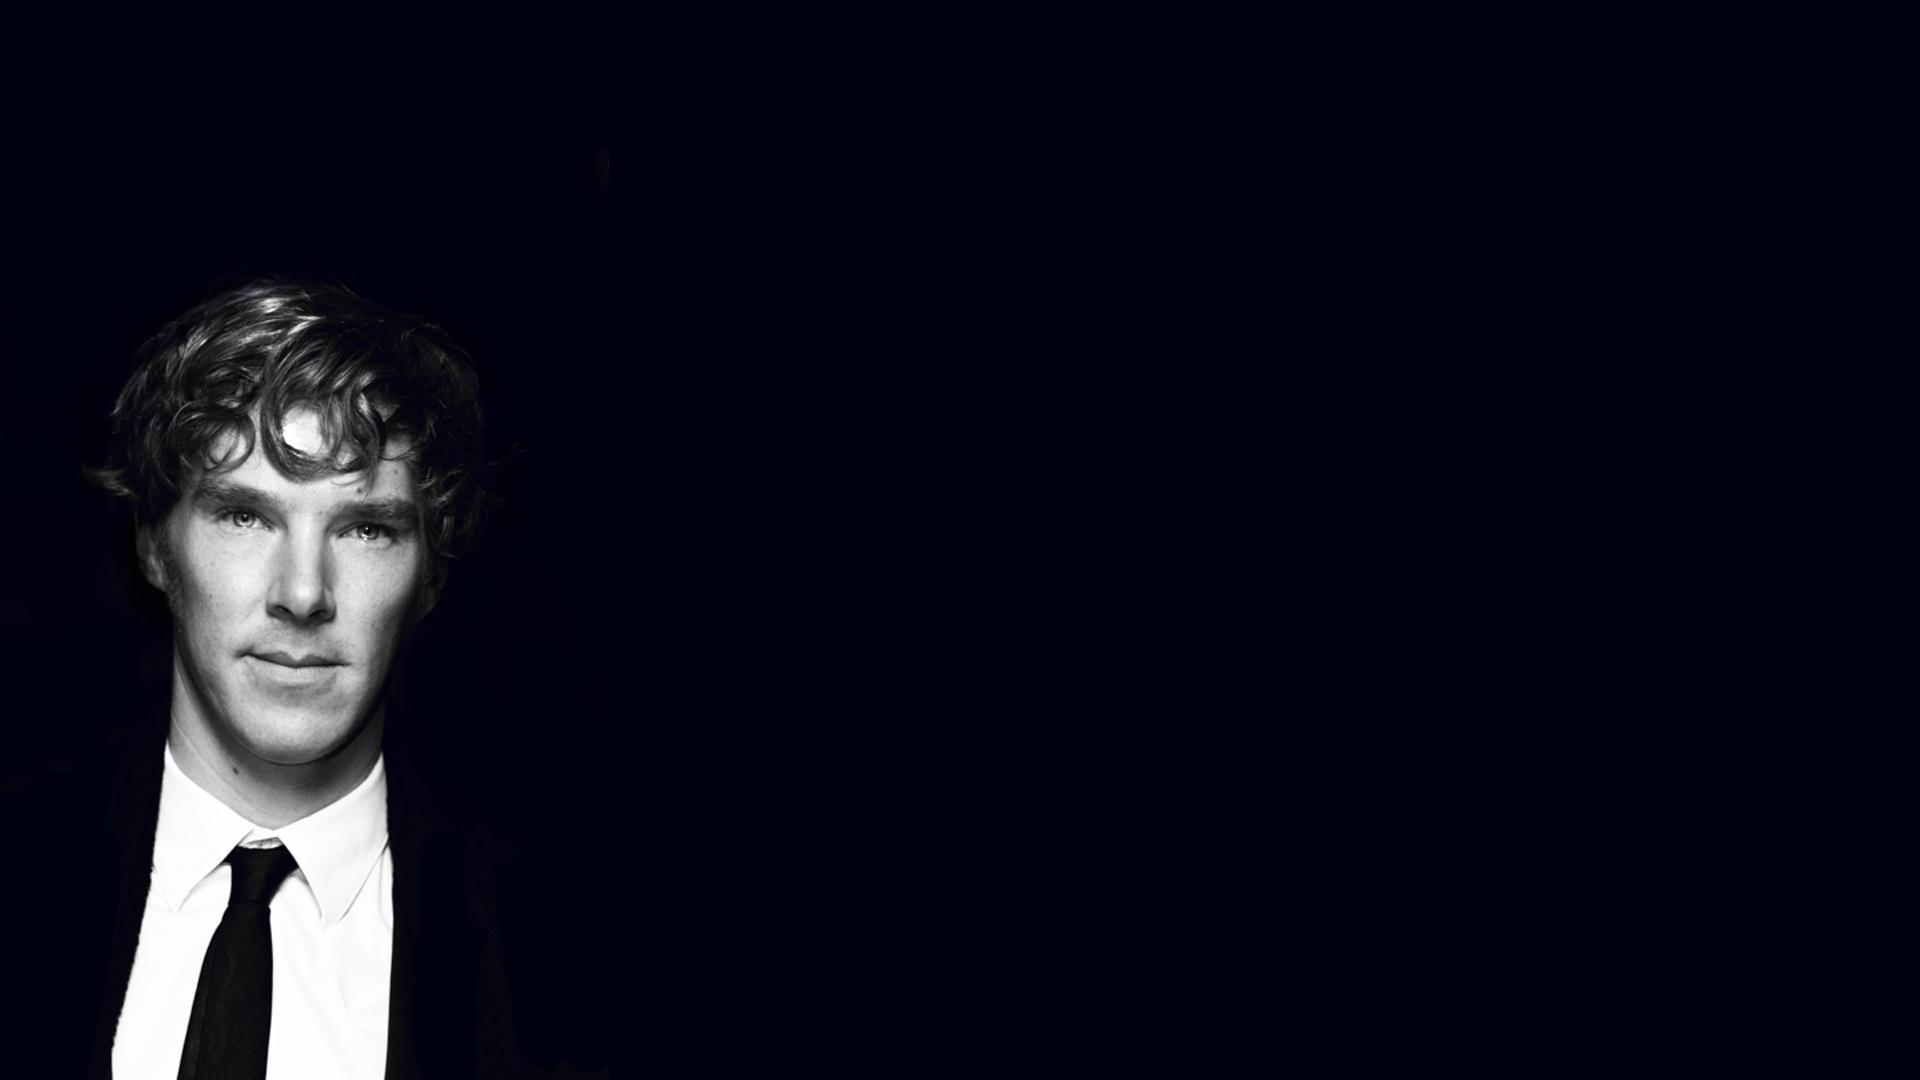 Benedict Cumberbatch Wallpapers (115 Wallpapers) – HD ...